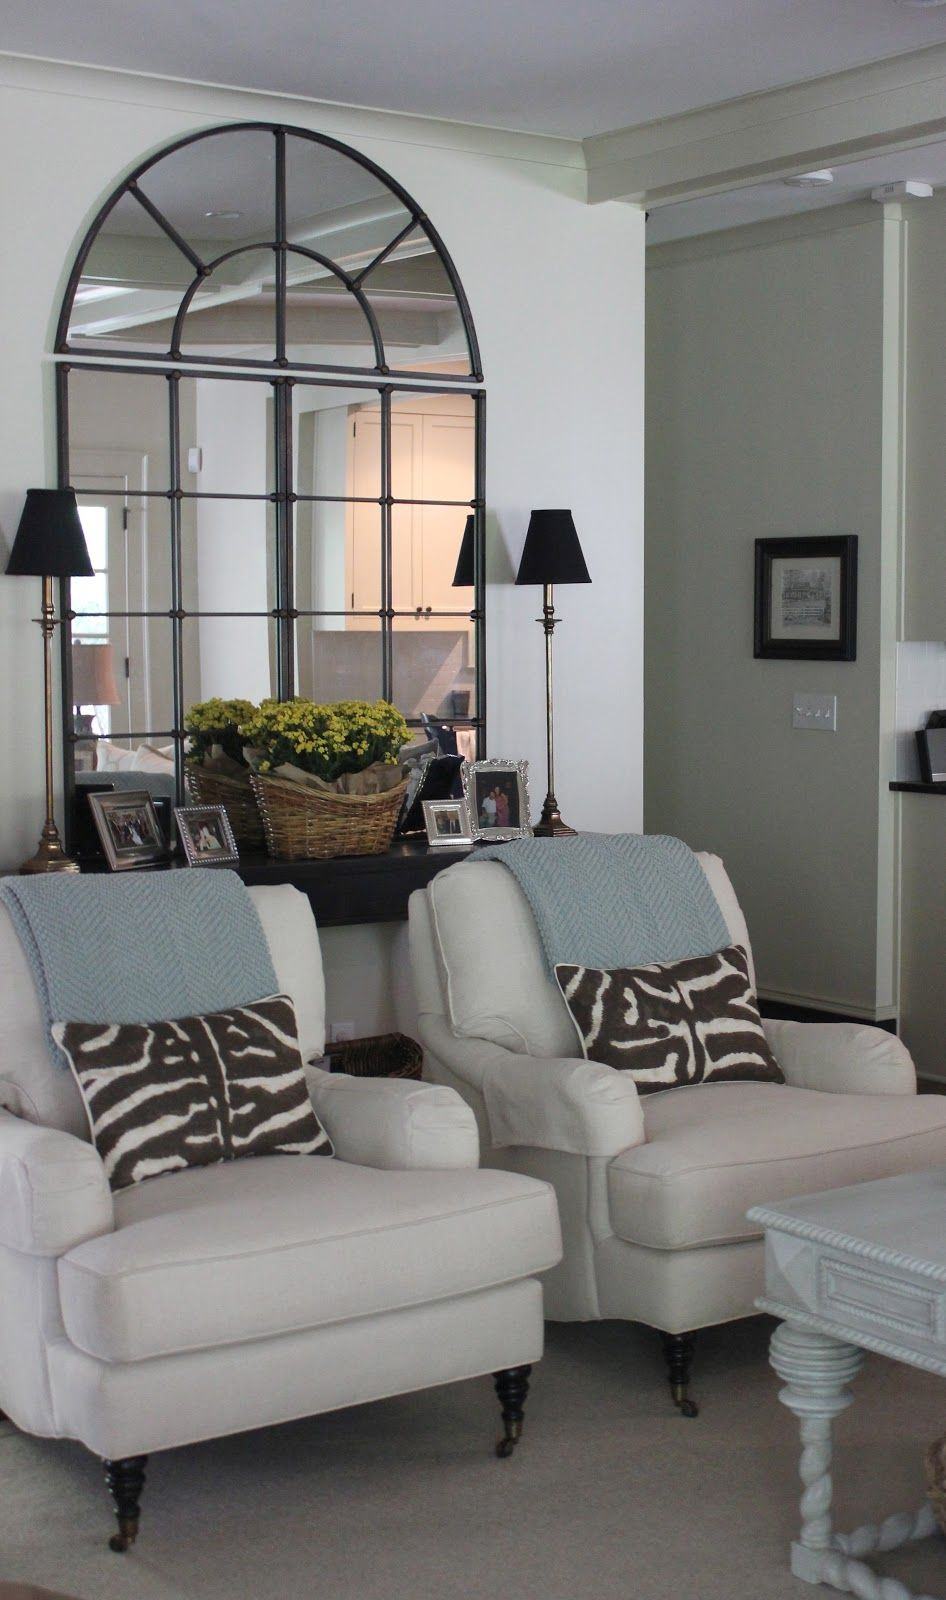 ballard design | for the home | pinterest | living room, room and decor